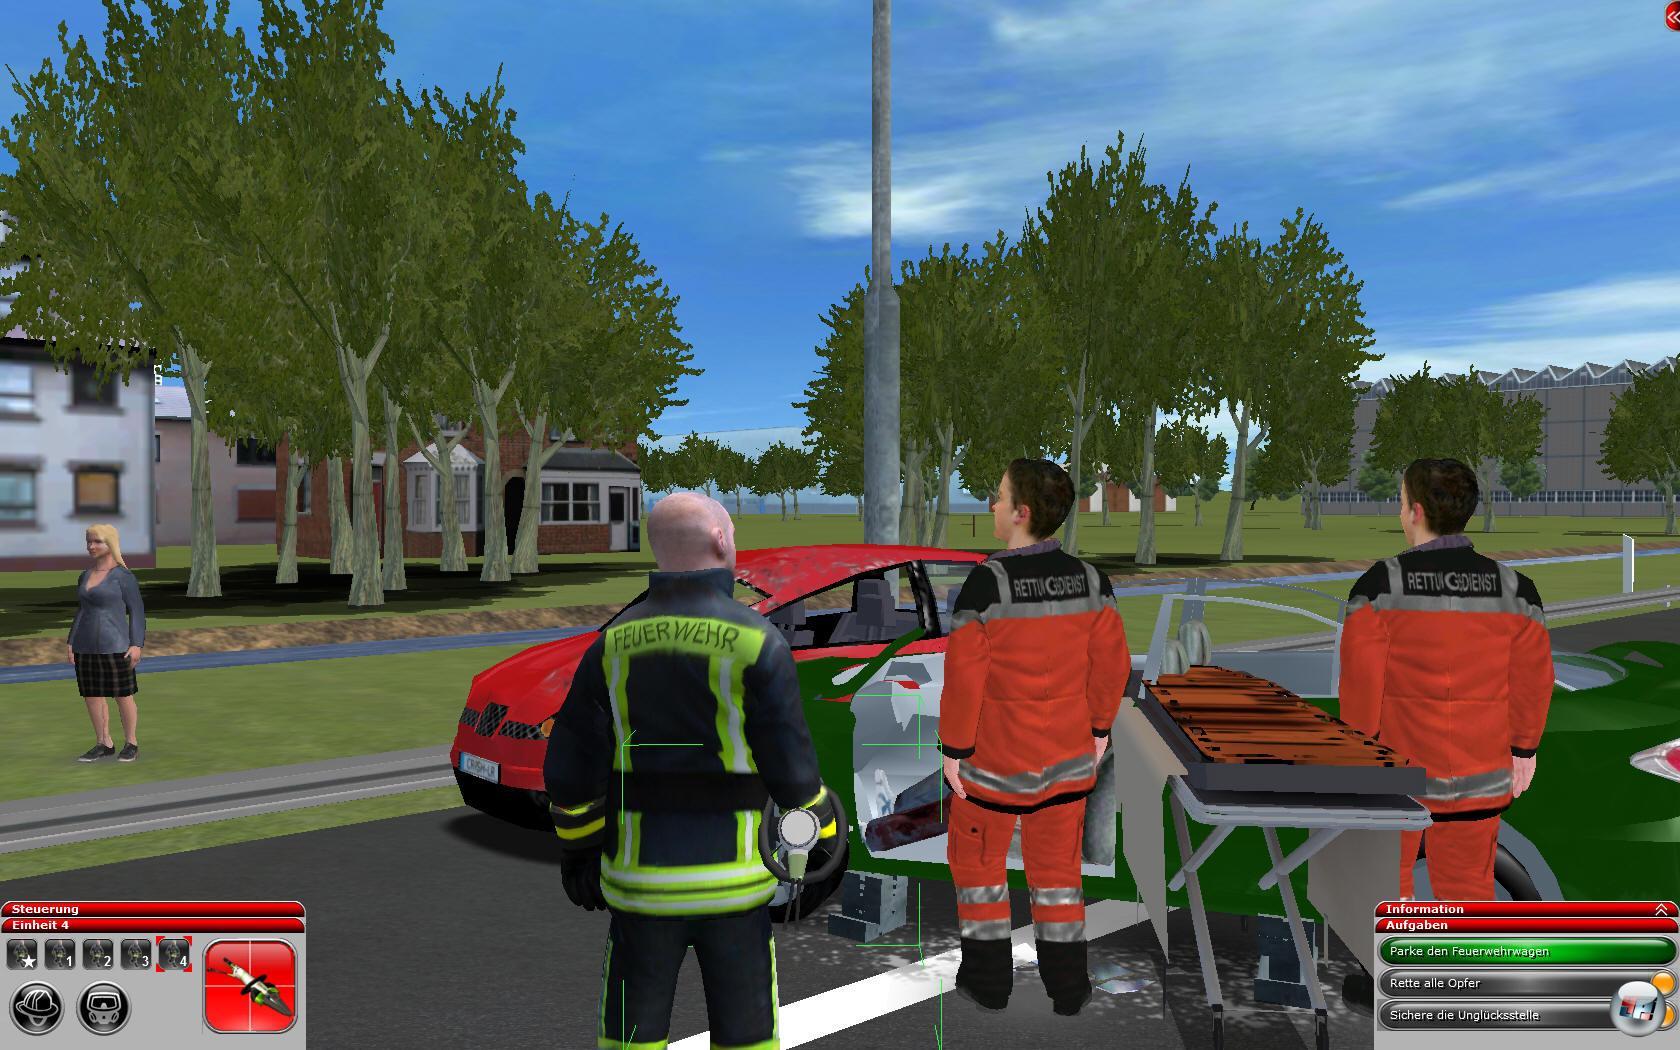 Feuerwehr-Simulator 2010 - Test, Simulation, PC - 4Players.de